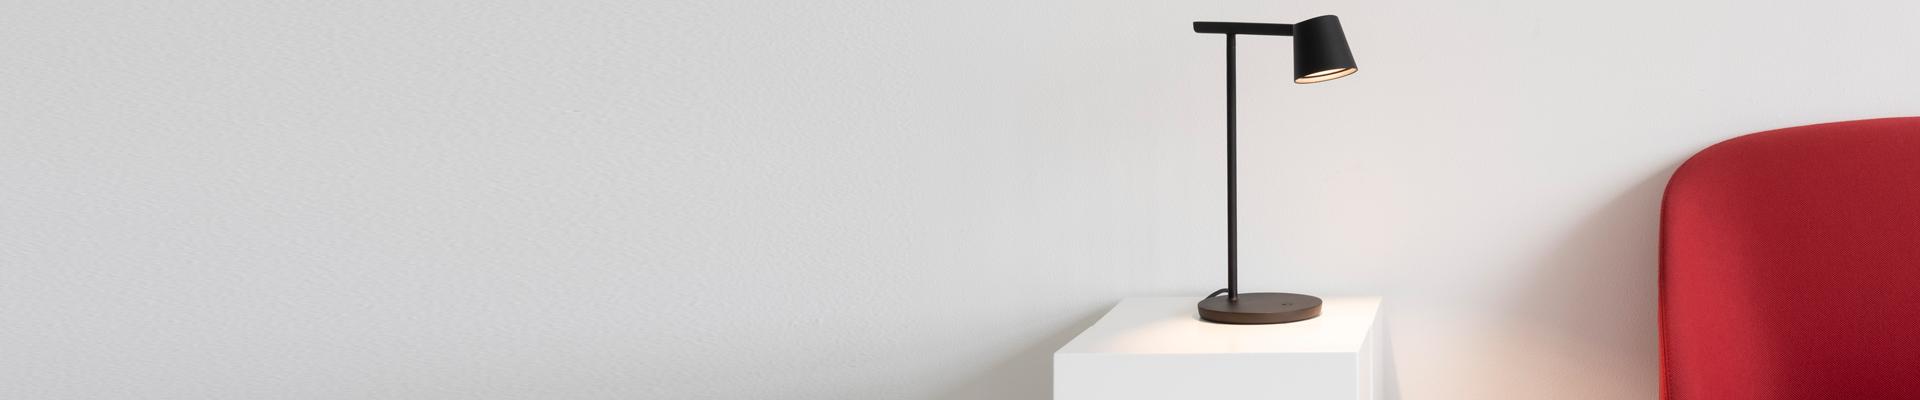 Muuto lampe - Stilrent design